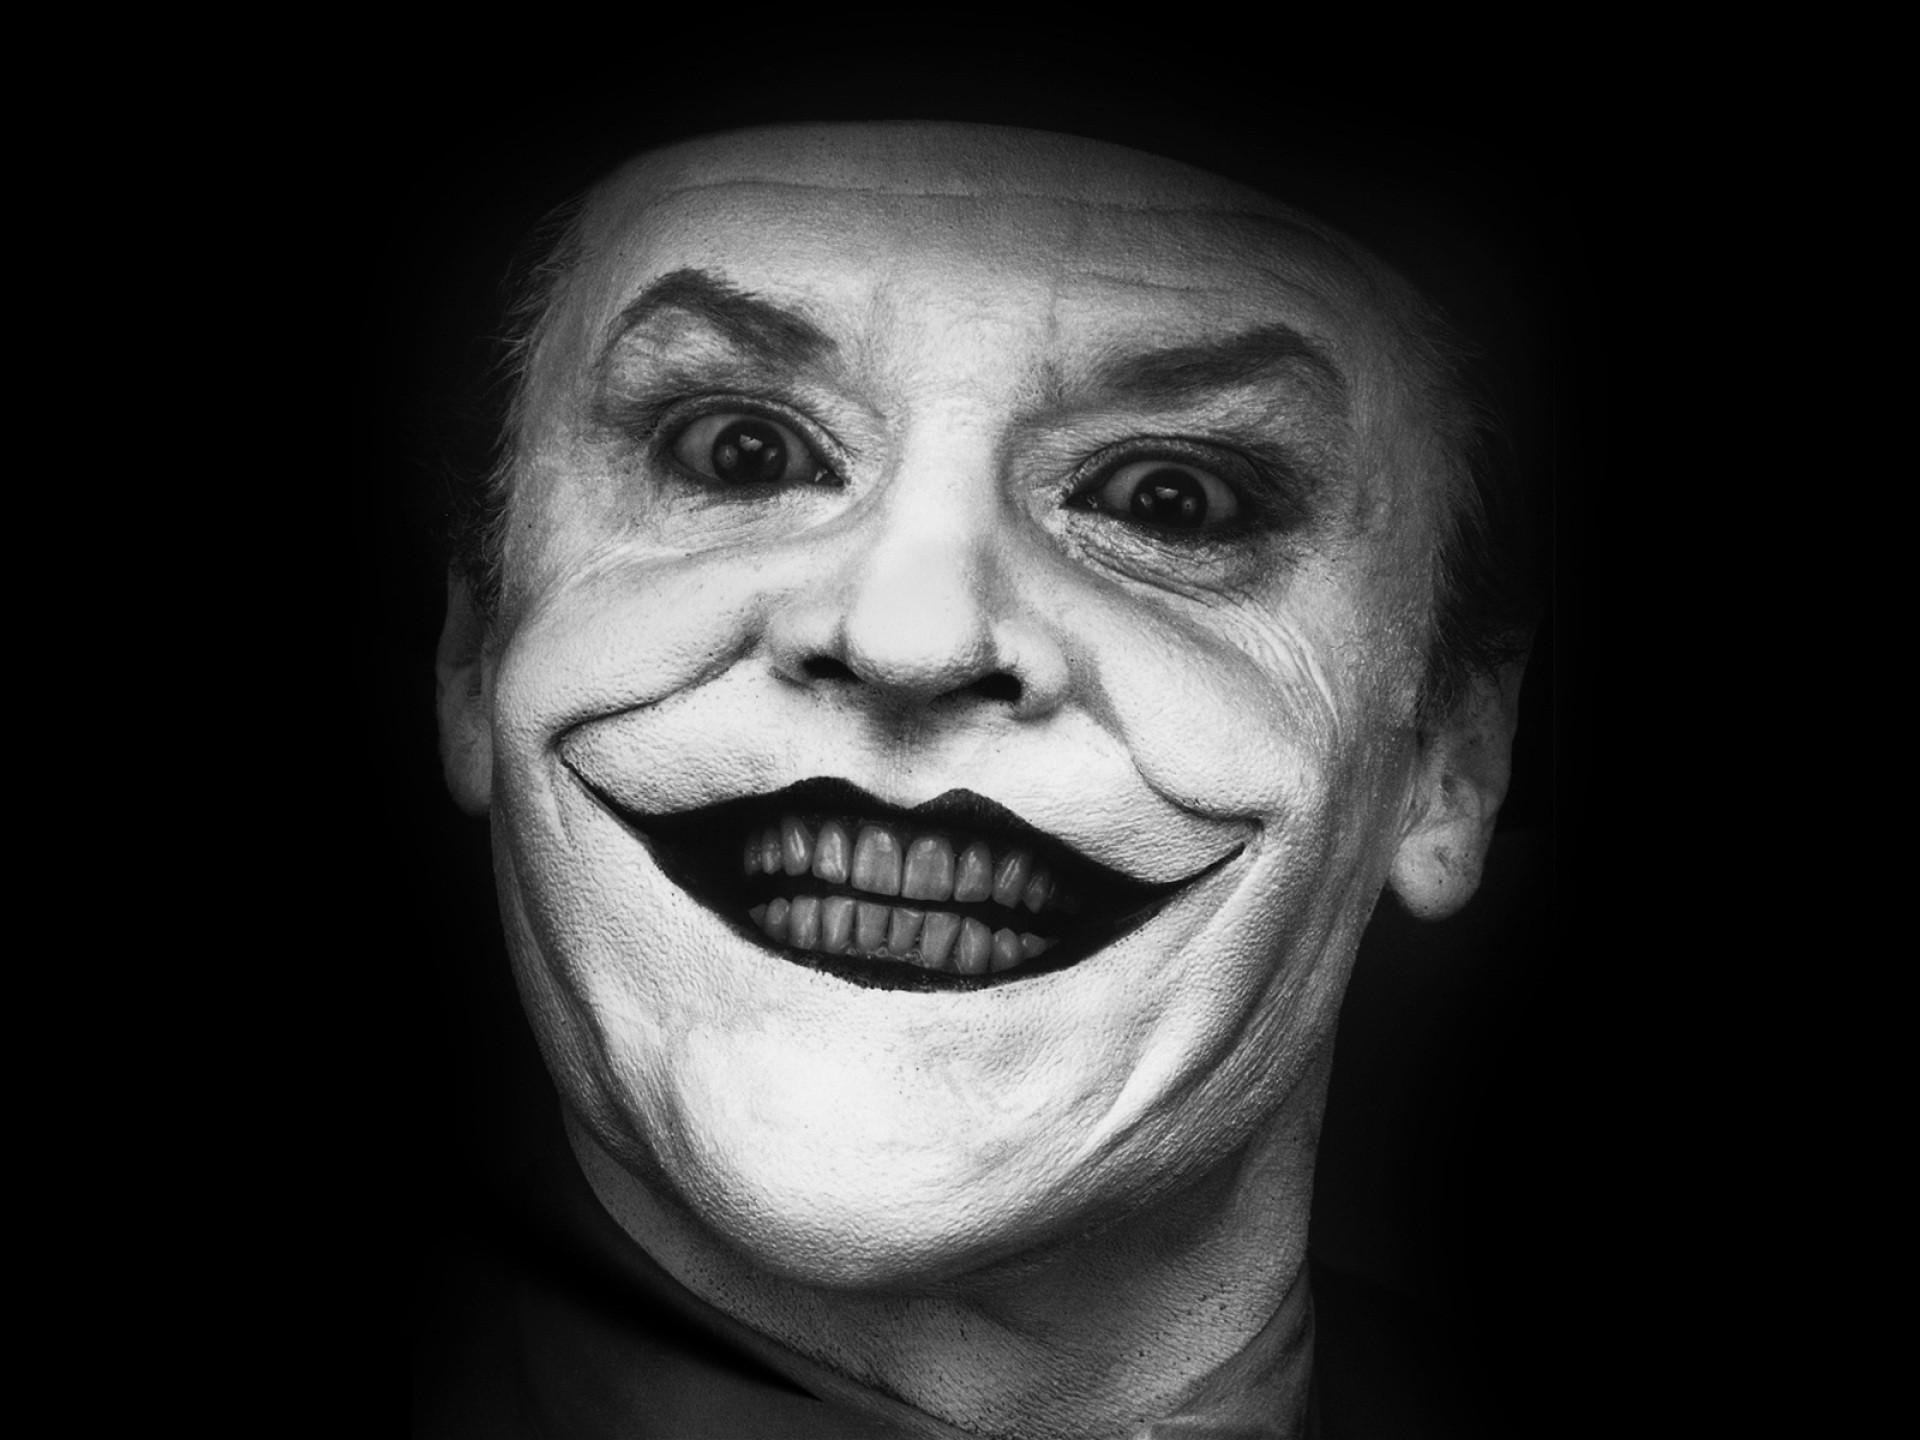 actor Jack Nicholson joker smile black background 1920x1440